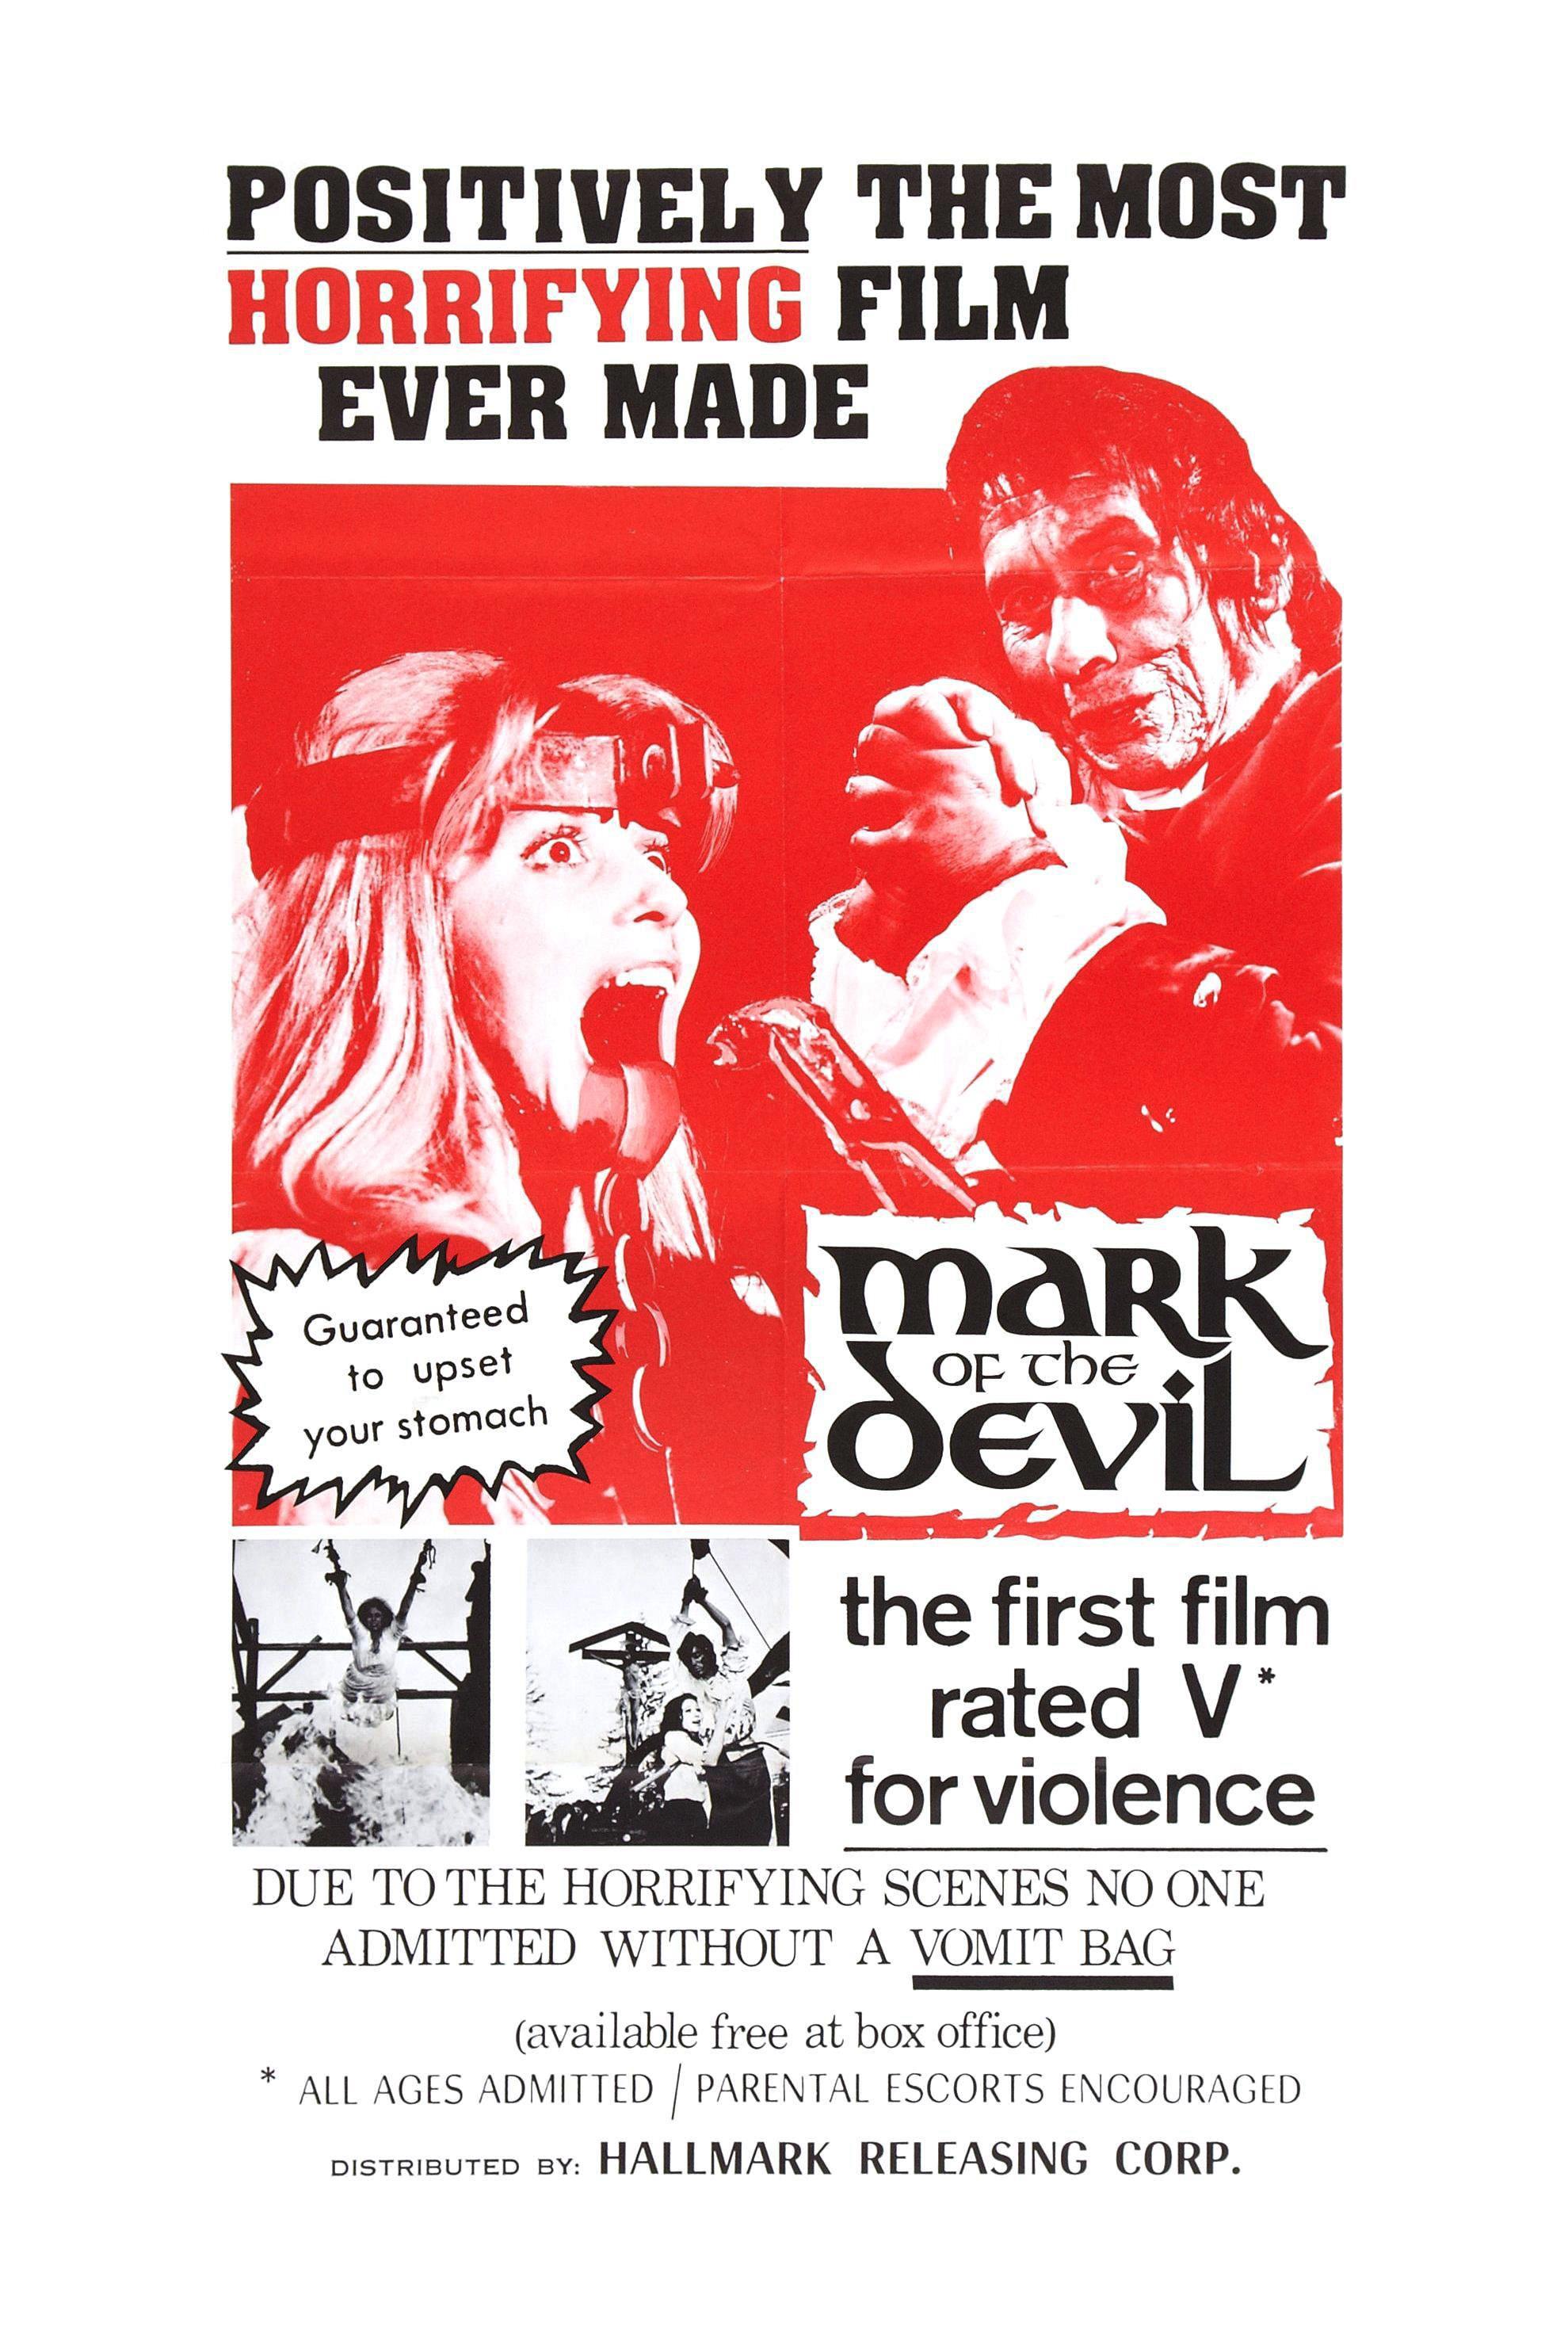 HMM mark of the devil poster